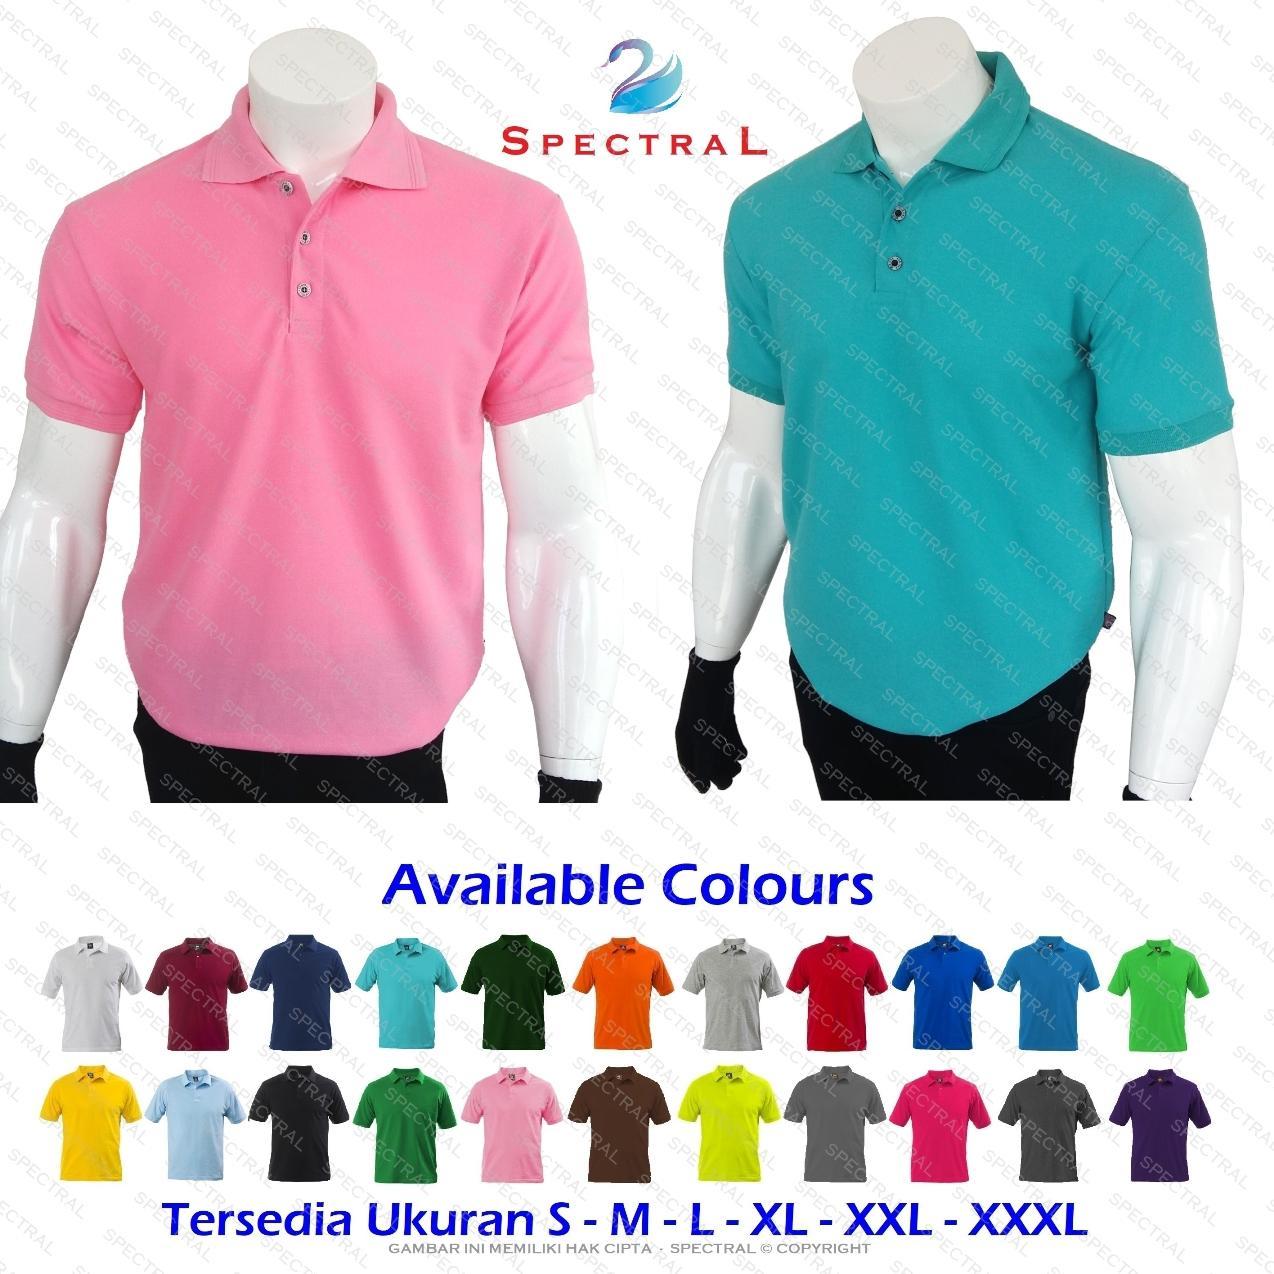 HARGA PROMO ☆ SpectraL ☆ Premium Polo Shirt ☆ Continues Stock ☆ 22 Pilihan  Warna Konsisten e126ed12bb